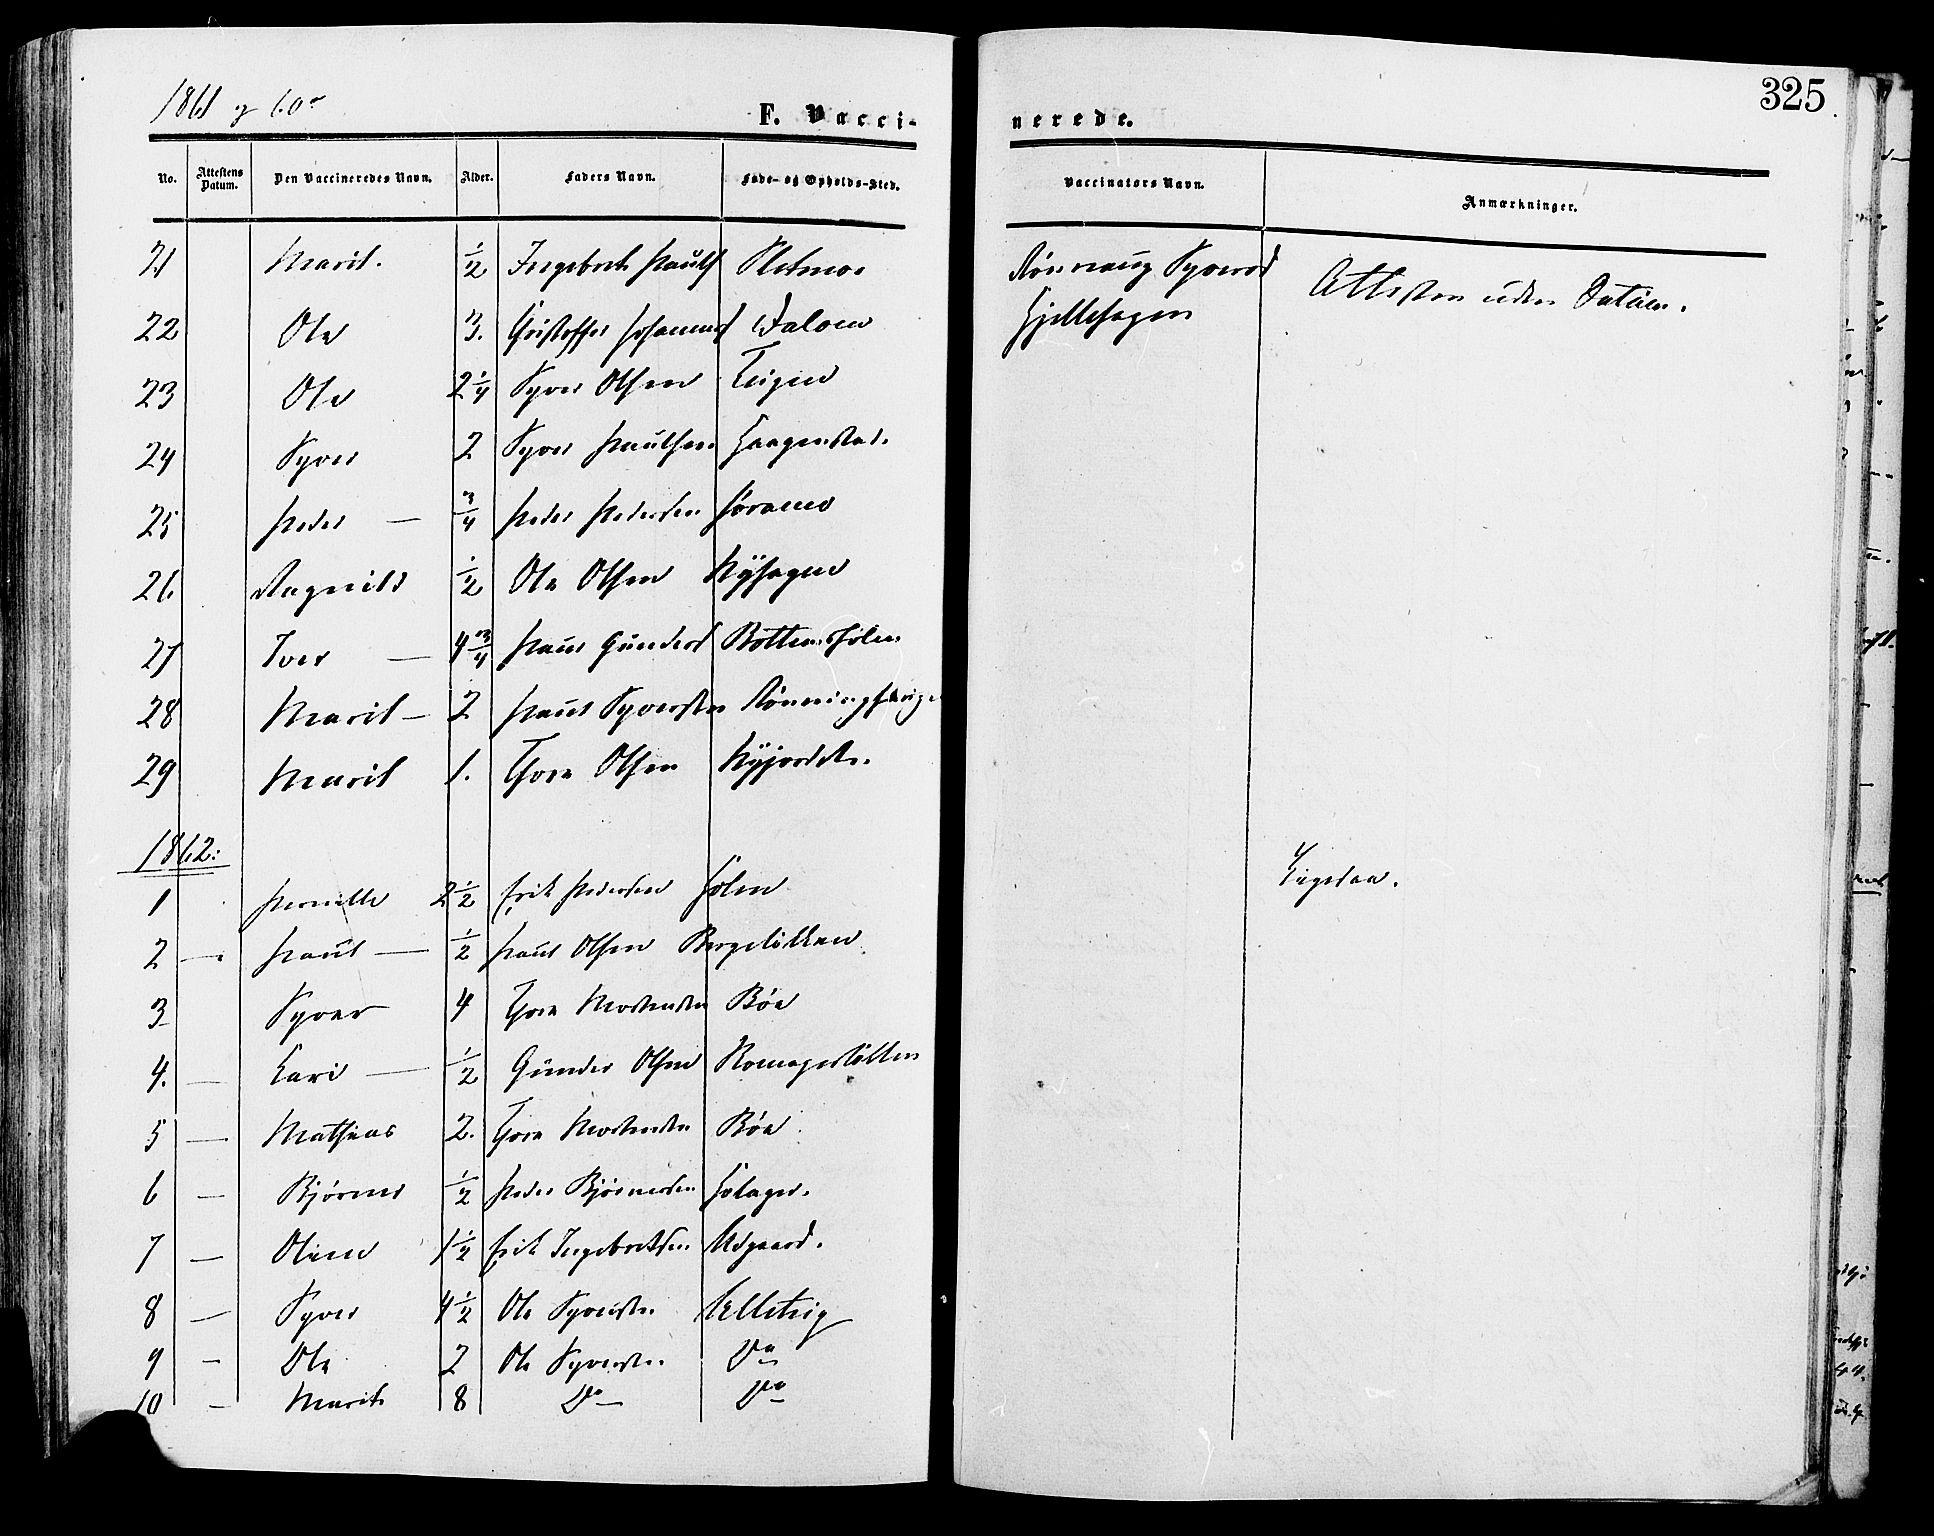 SAH, Lesja prestekontor, Ministerialbok nr. 9, 1854-1889, s. 325